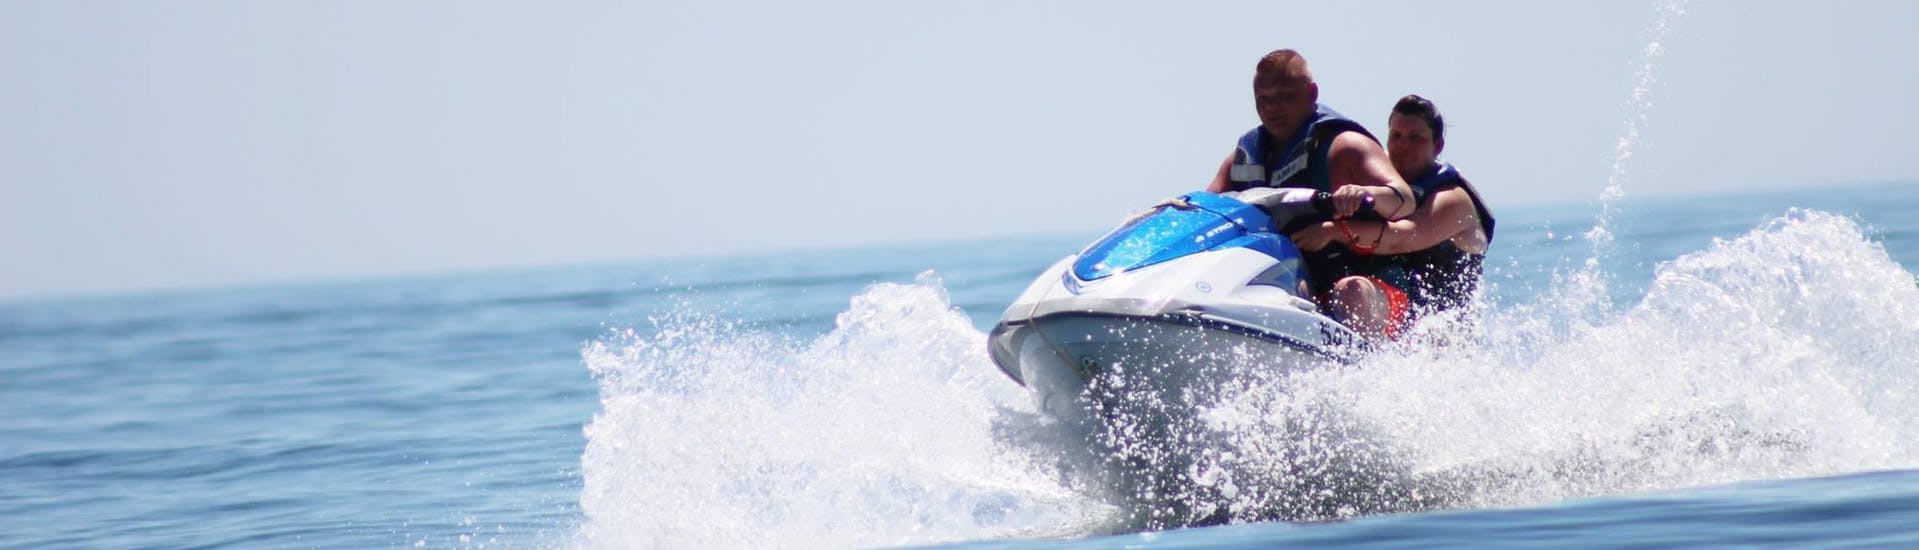 jet-ski-tour-20min-albufeira-nautifun-gale-hero